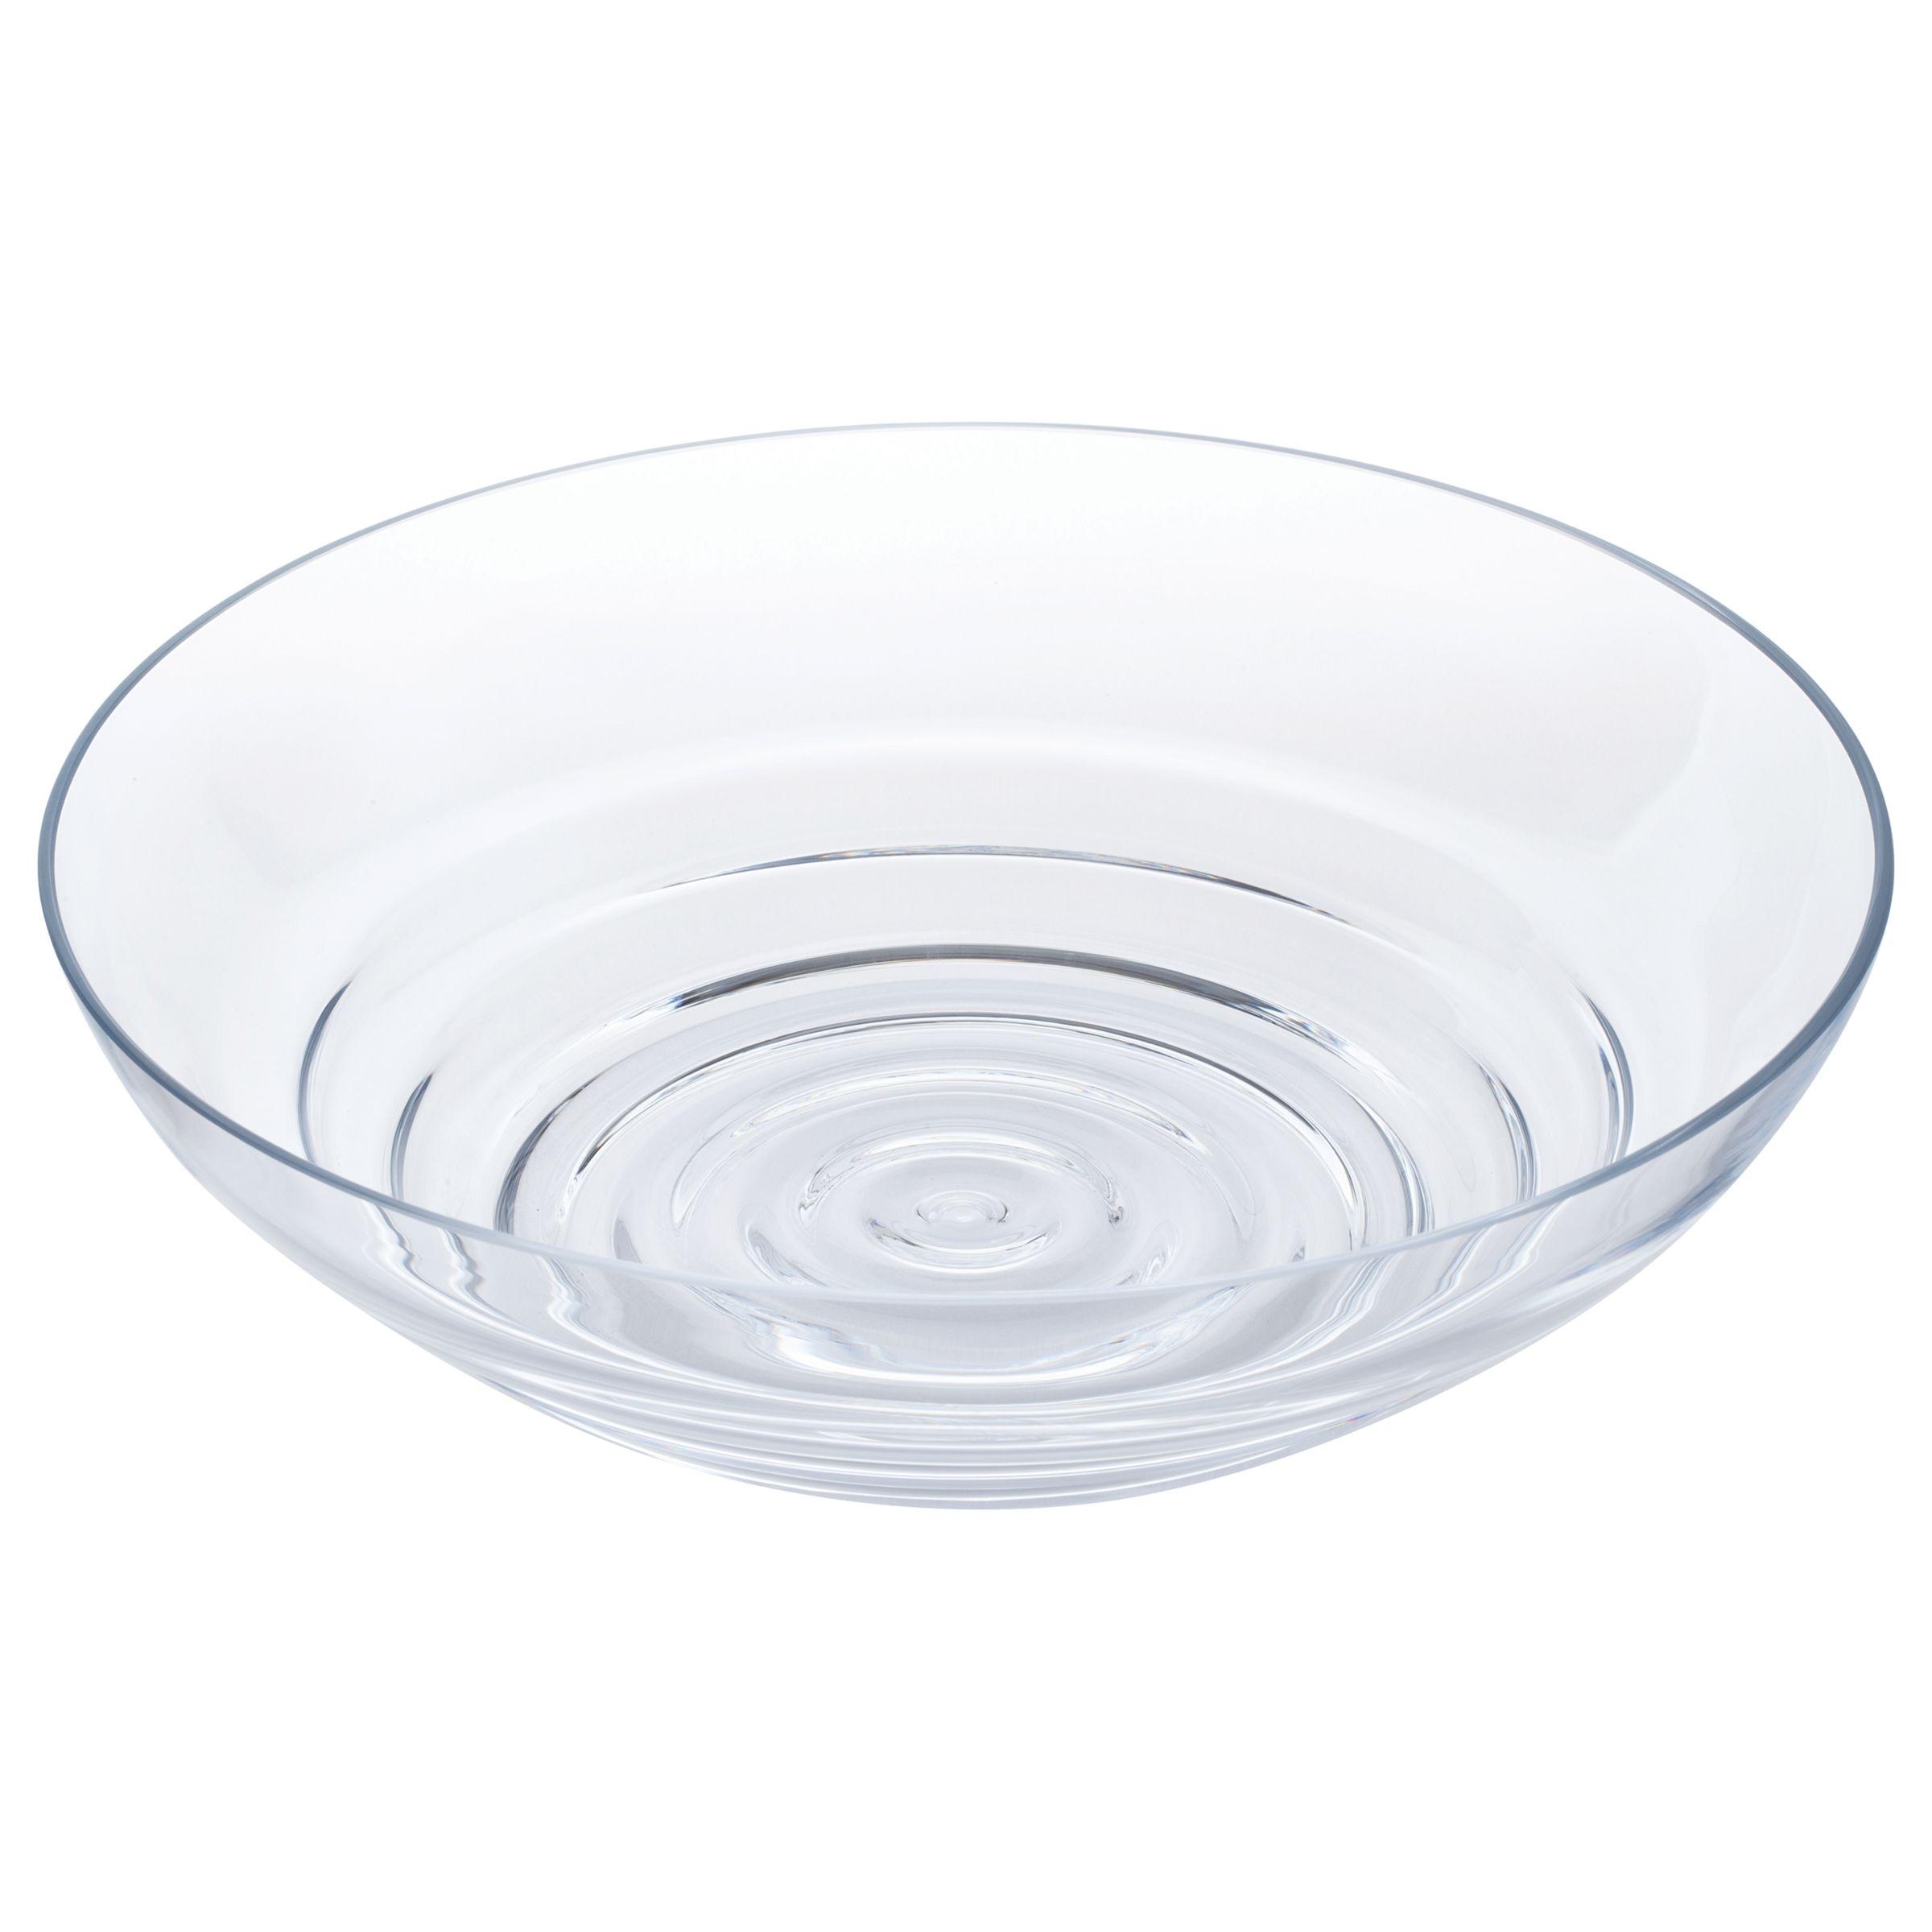 Dartington Crystal Dartington Crystal Wibble Centrepiece Bowl, Clear